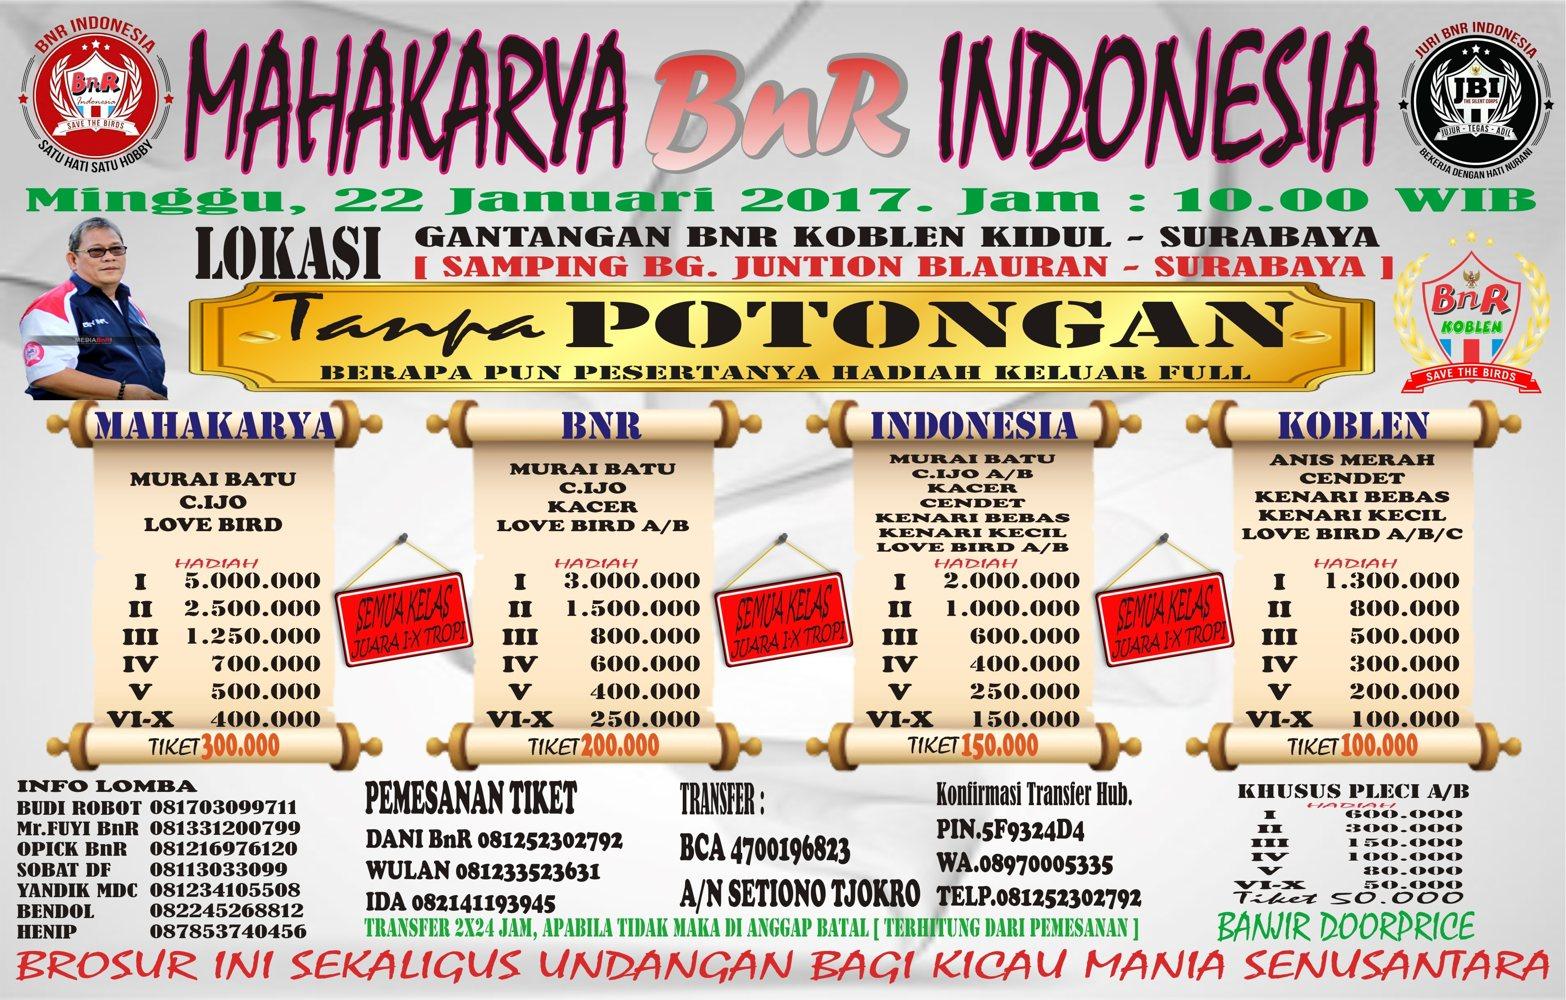 brosur bnr mahakarya indonesia, mediabnr, bnr community, surabaya,